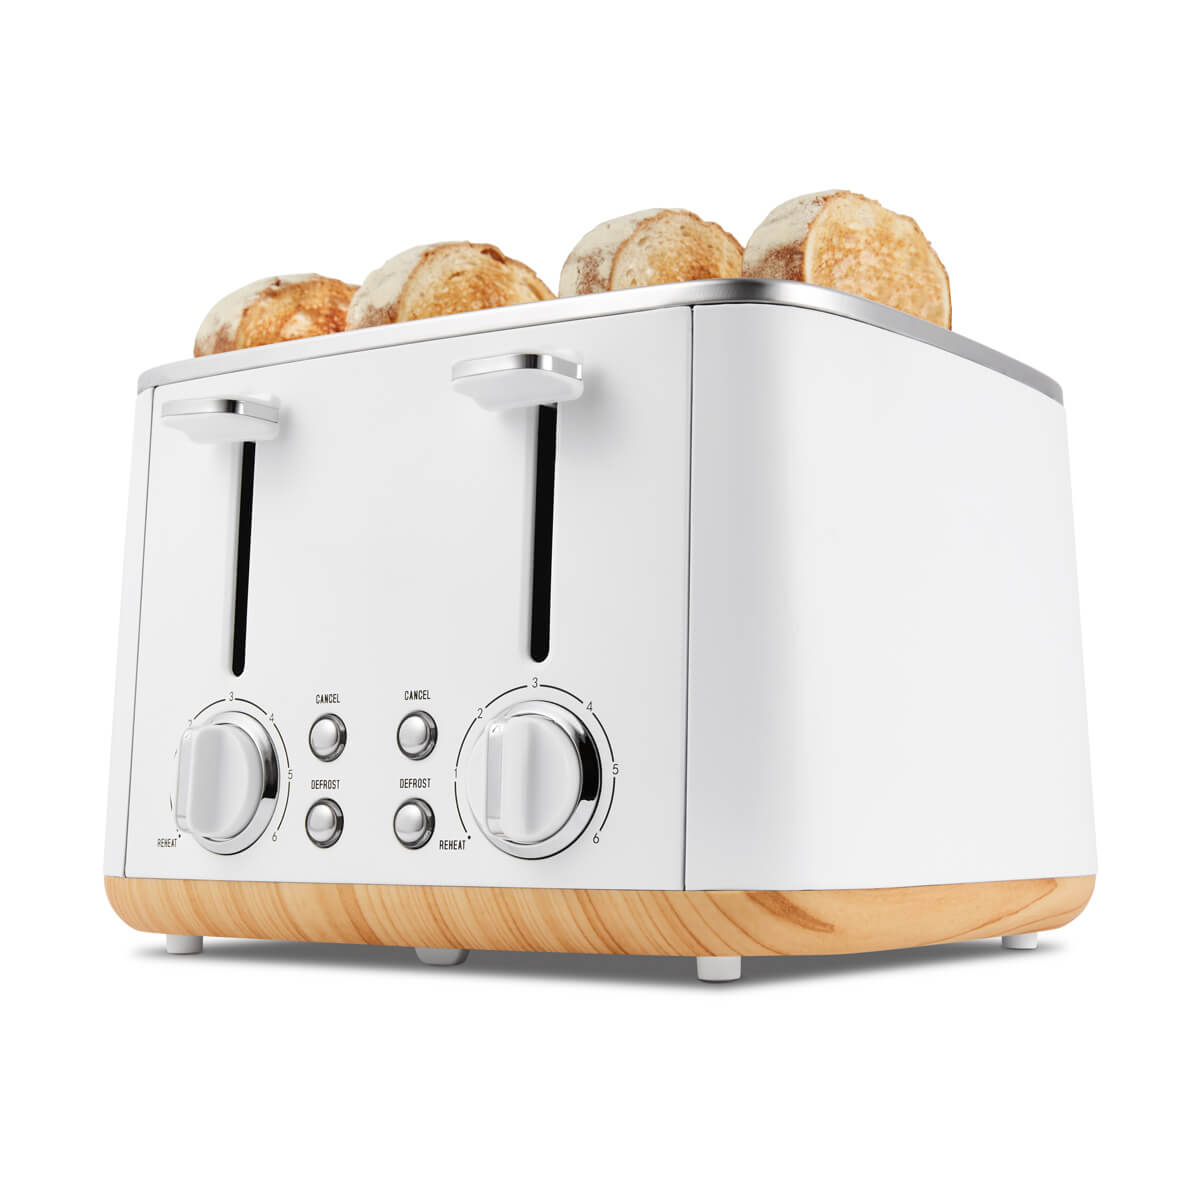 4 Slice Scandi Toaster Kmart.jpg